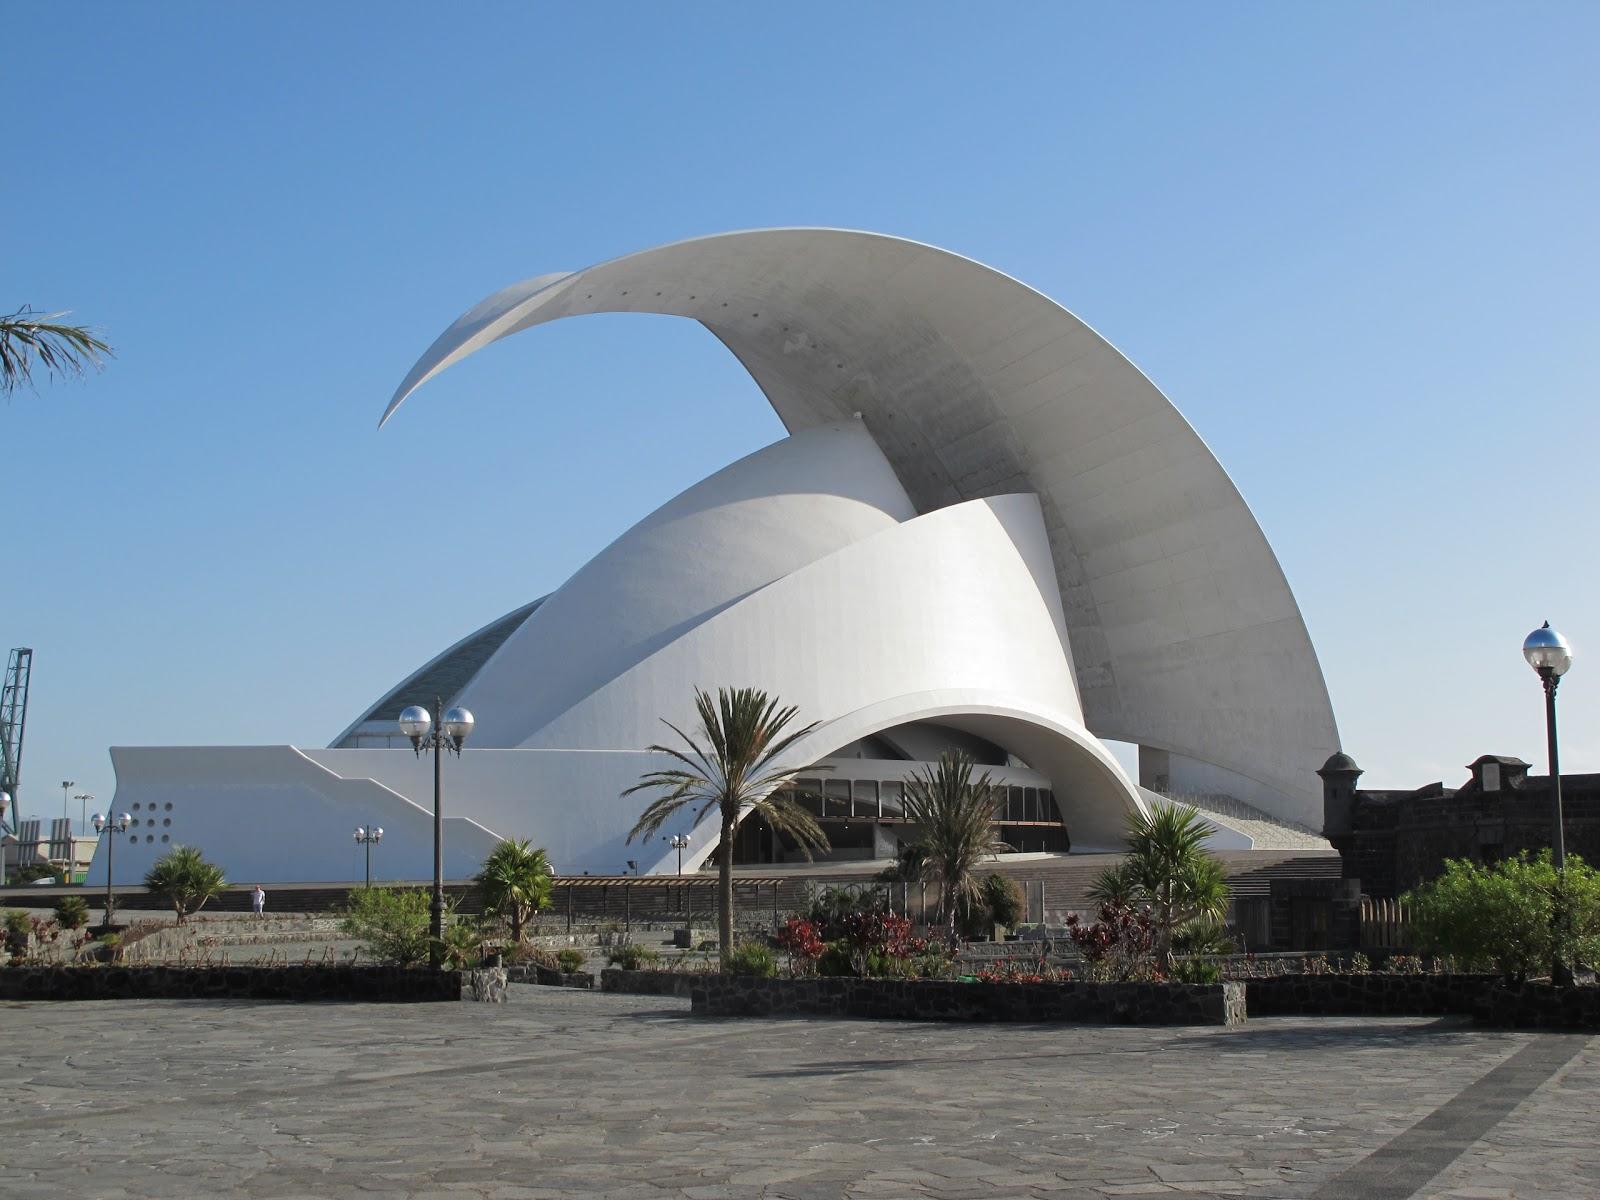 Anna Netrebko: Auditorio de Tenerife, Santa Cruz de ...  Anna Netrebko: ...